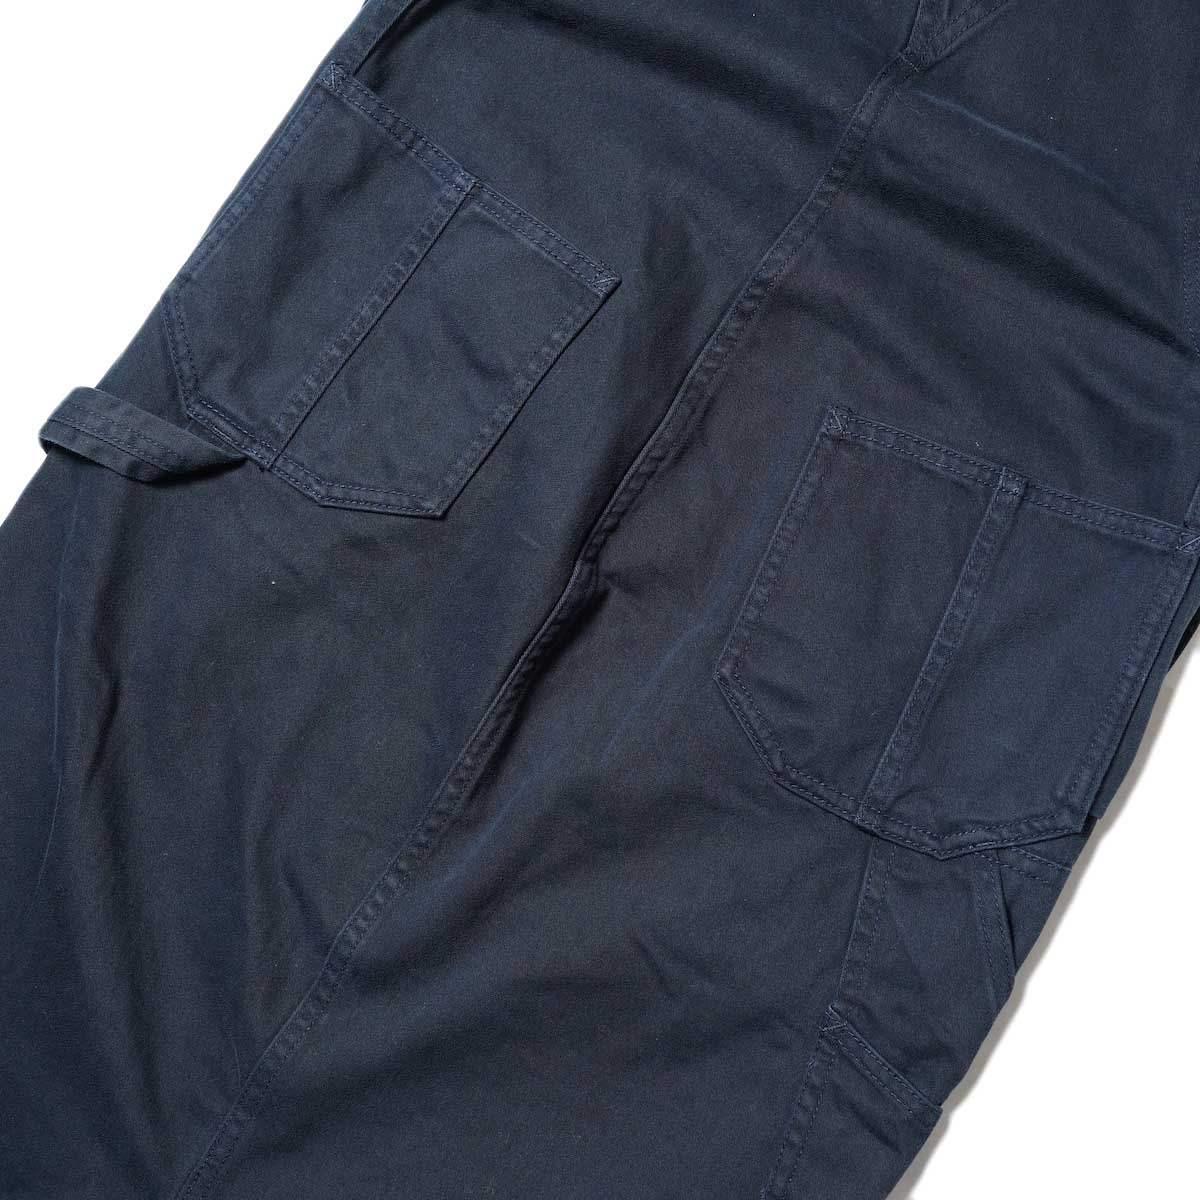 BLUEBIRD BOULEVARD / Classic Warm Worker Satin Jumper Dress (Navy) ヒップポケット